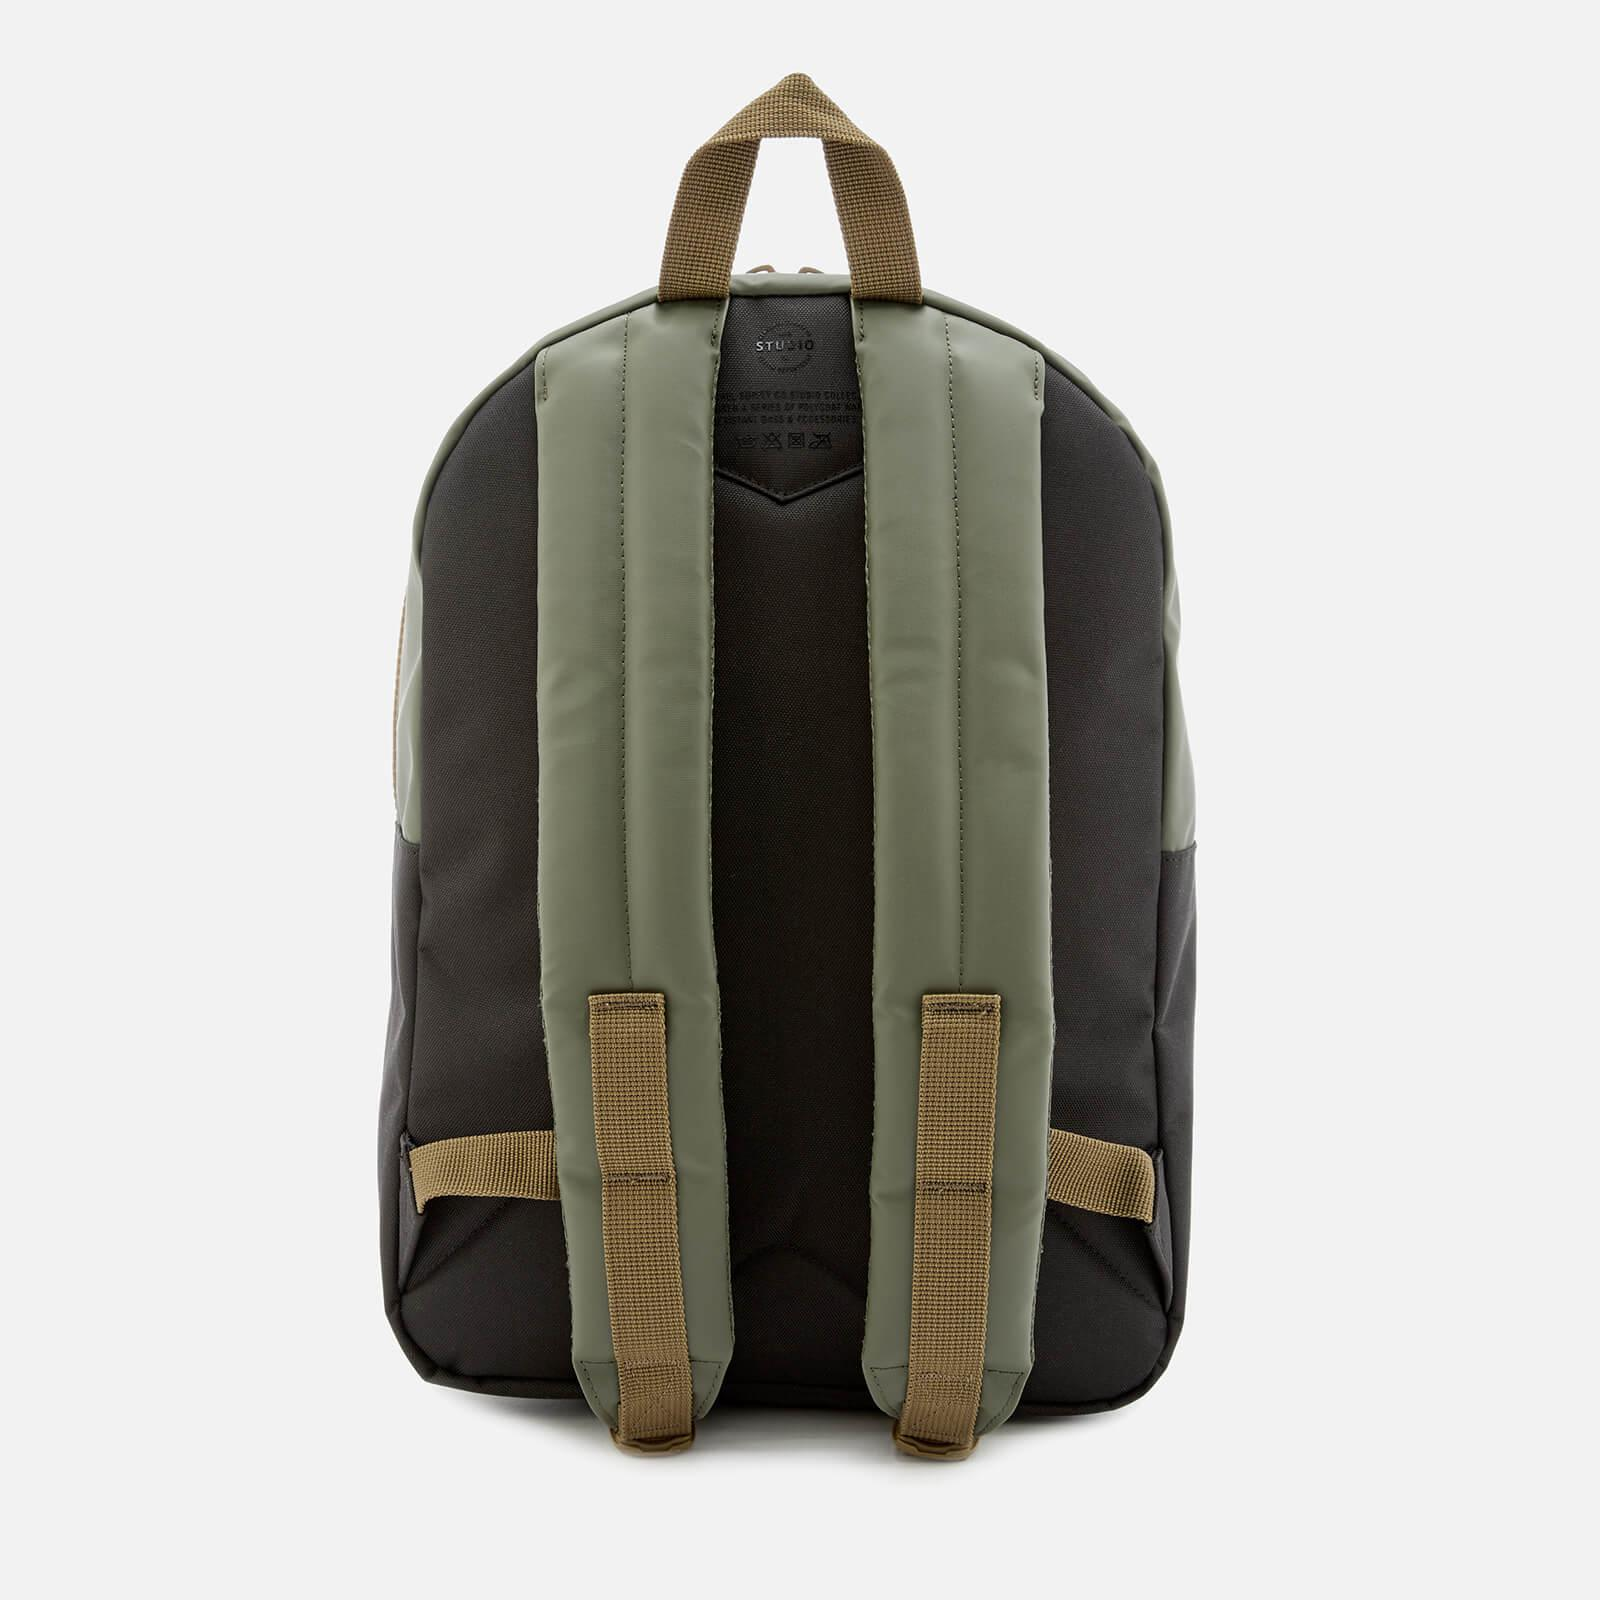 63b5f4da50 Herschel Supply Co. Winlaw Backpack in Green for Men - Lyst